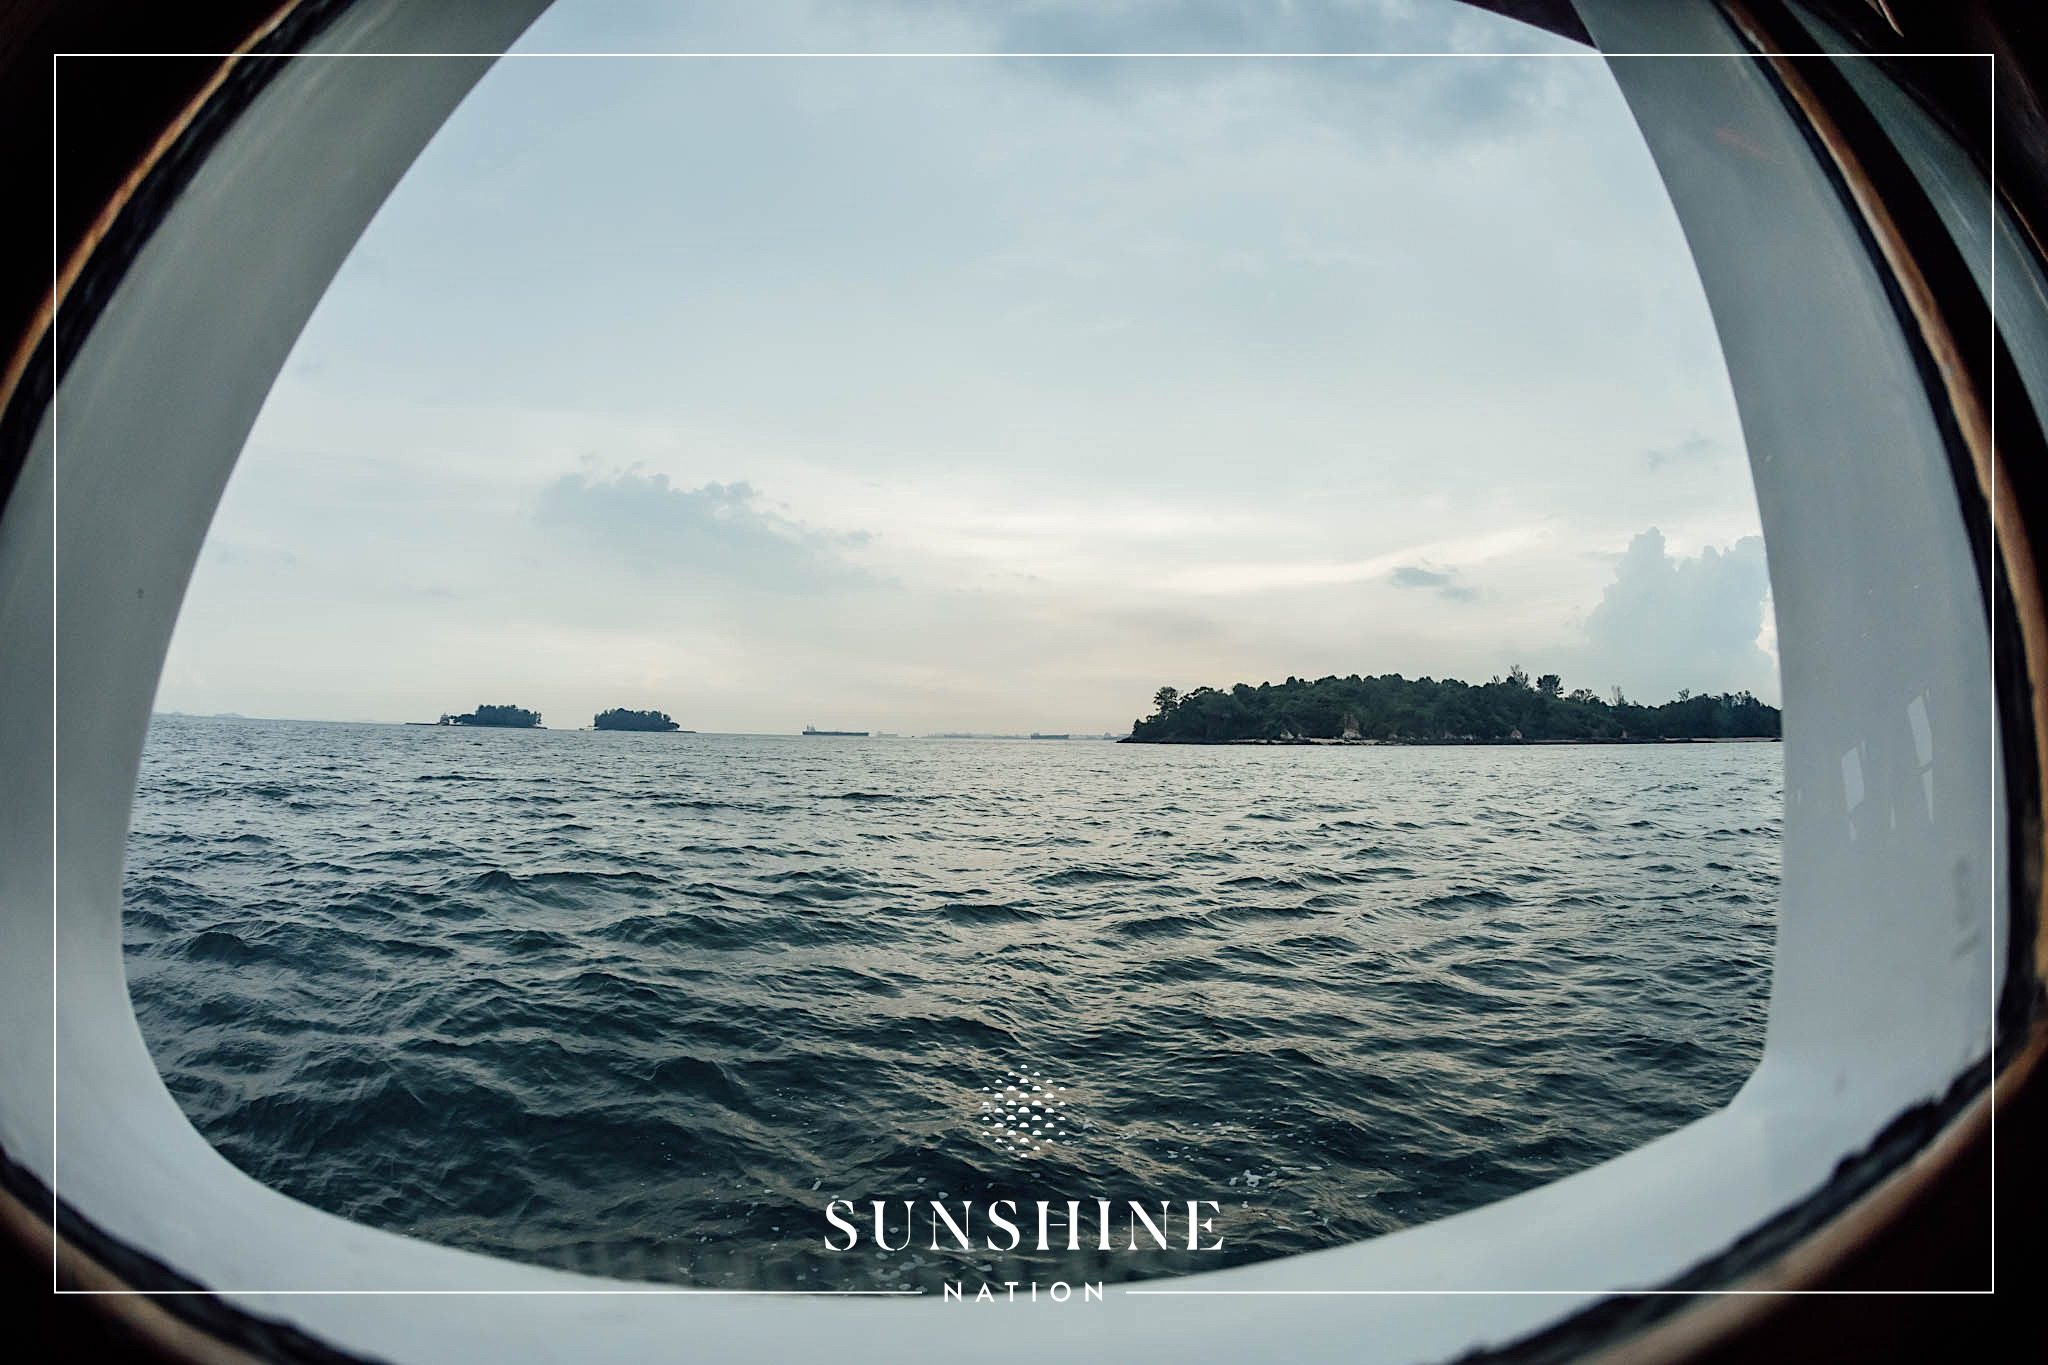 07102017_SunshineNation_Colossal048_Watermarked.jpg